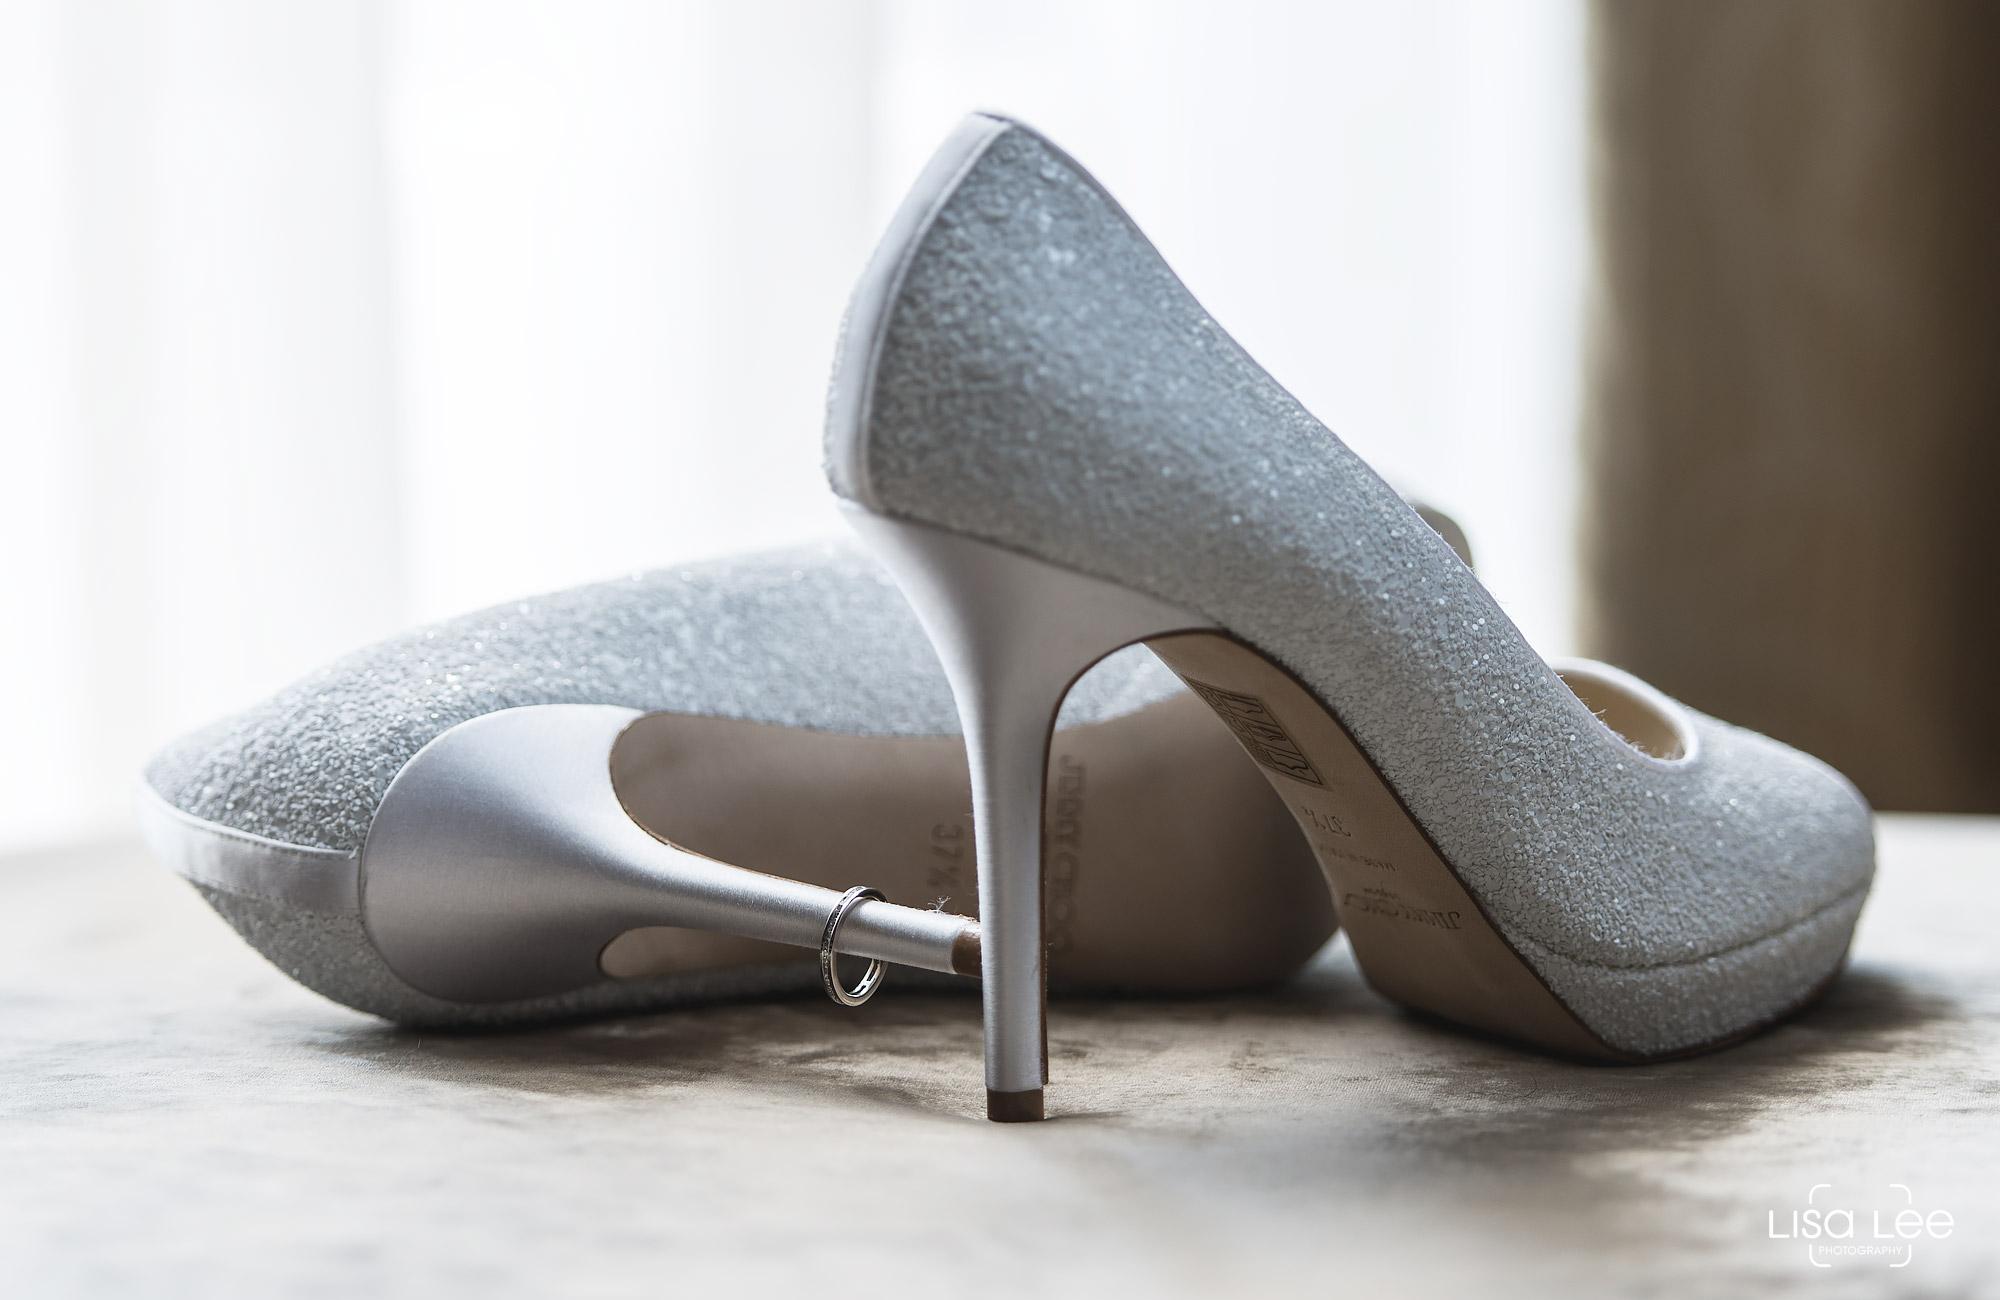 lisa-lee-wedding-photography-christchurch-dorset-shoes.jpg